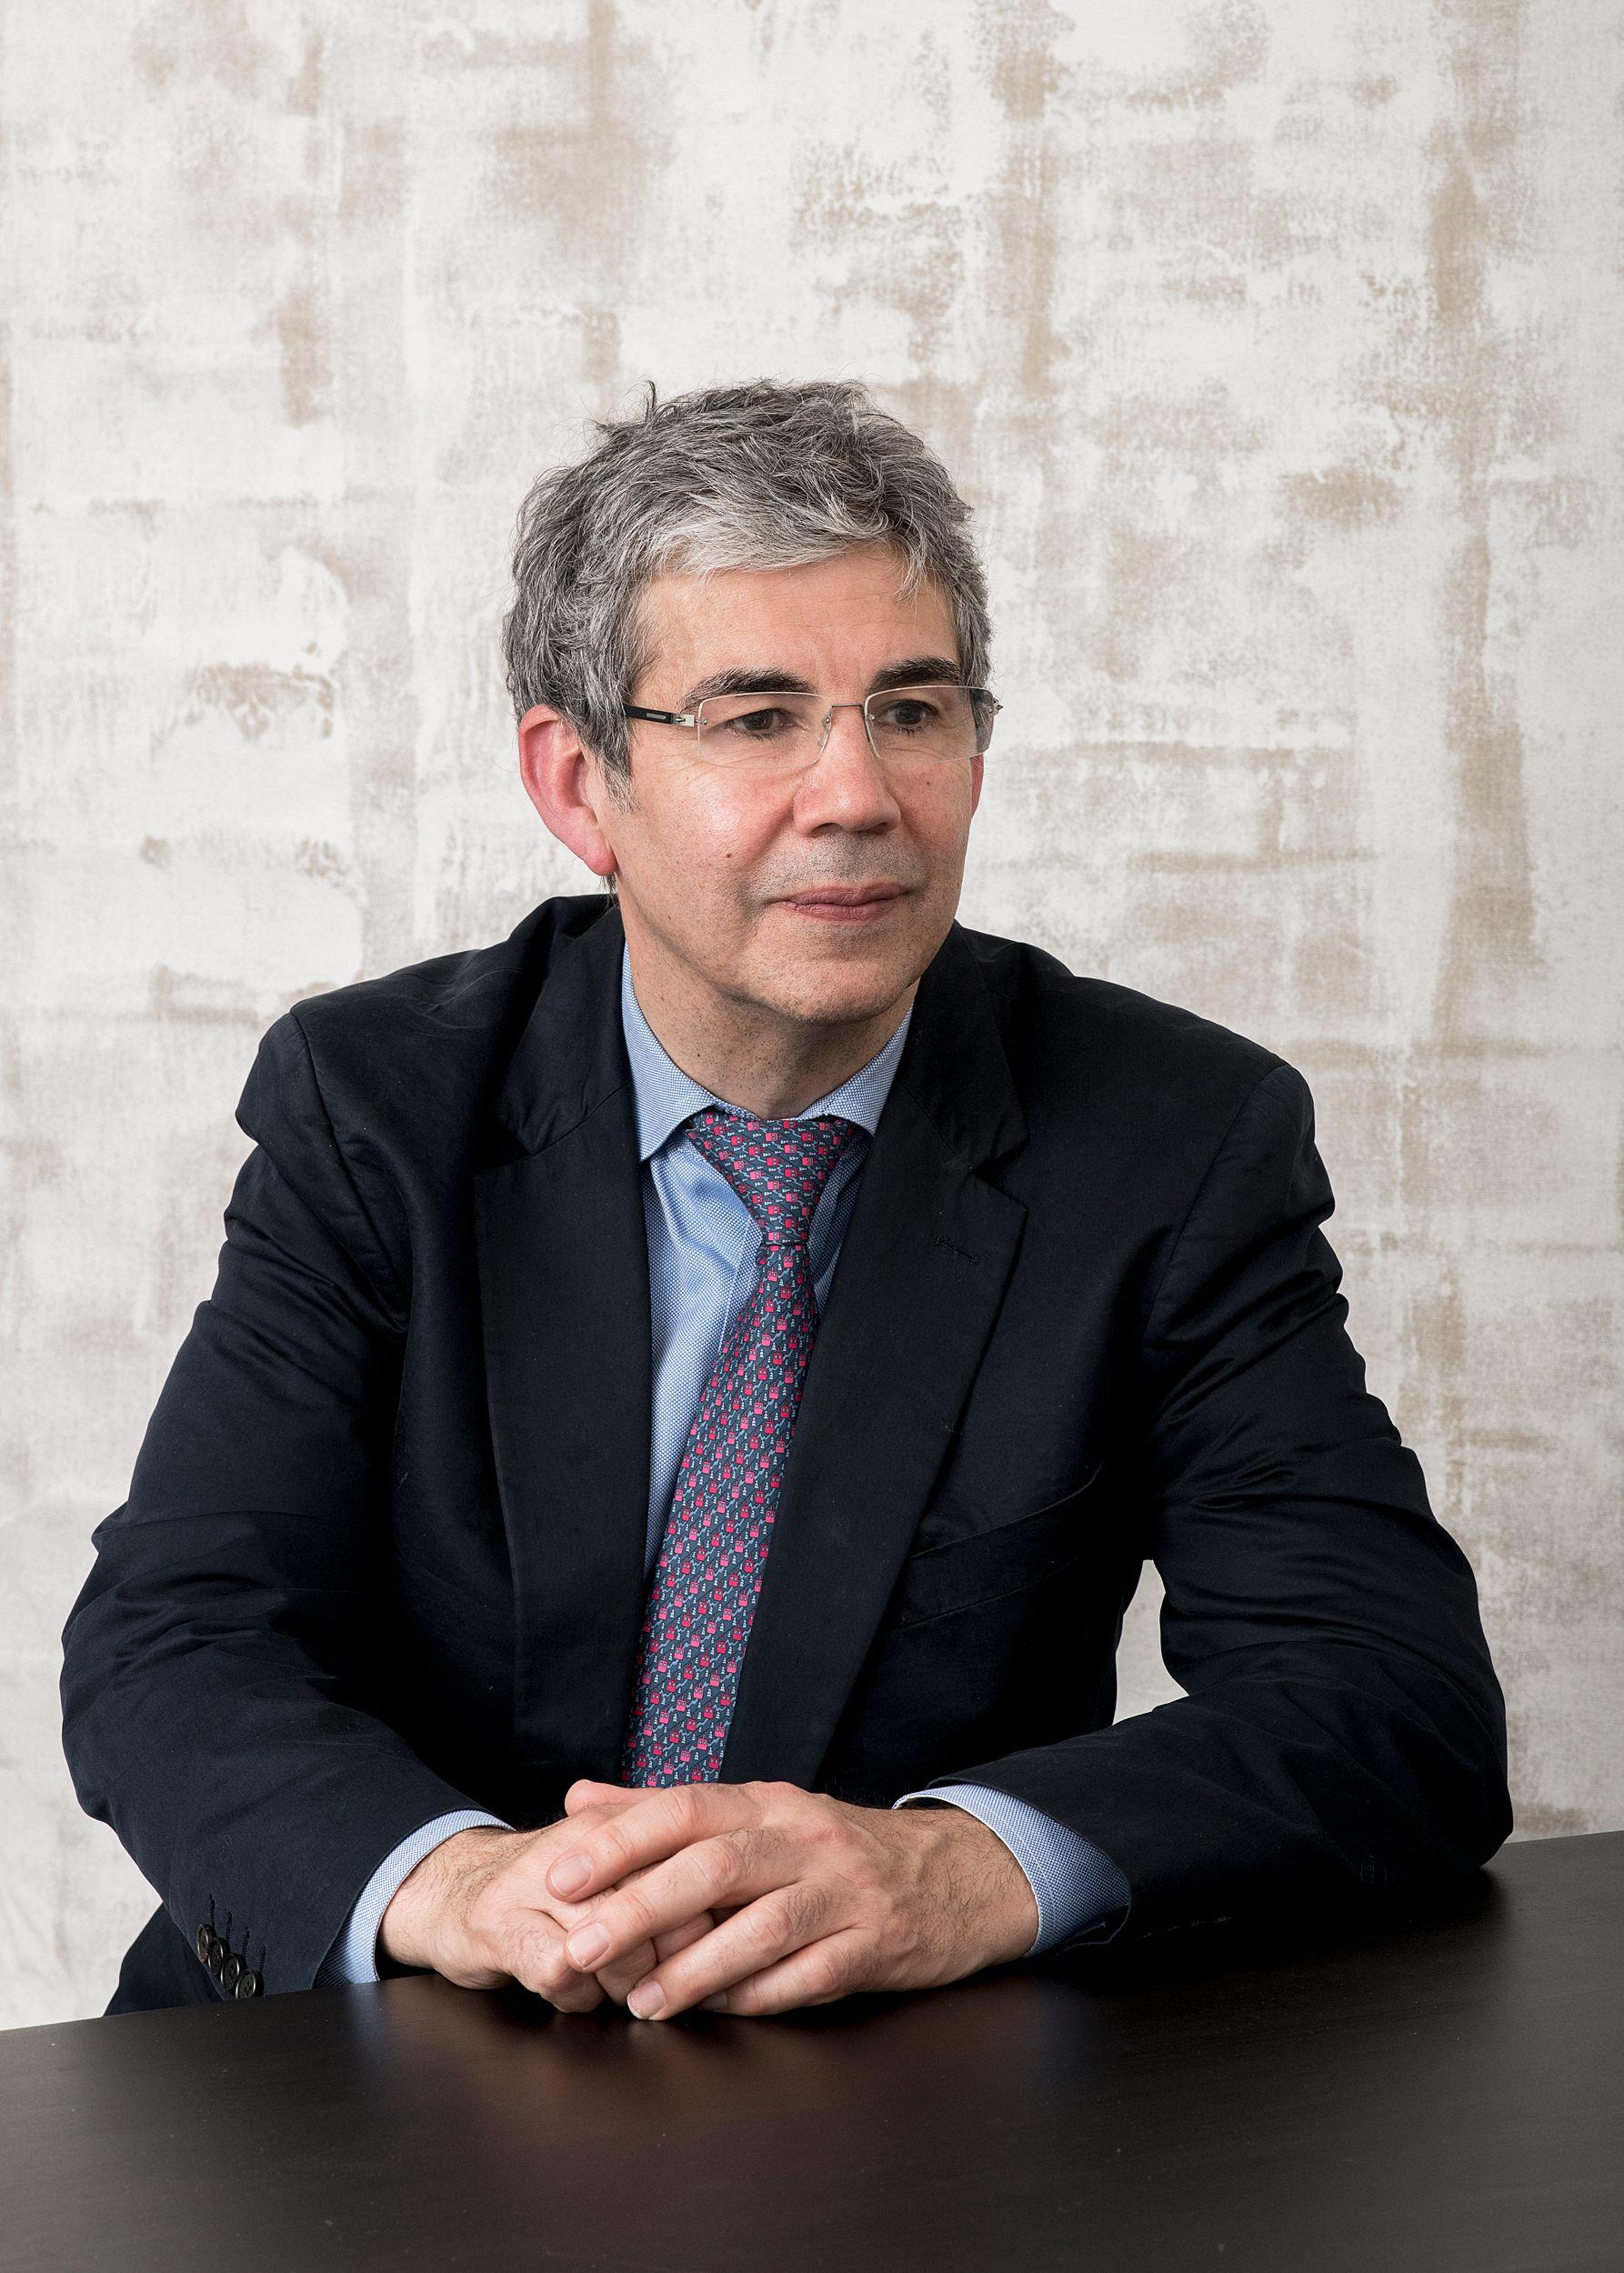 Dr David Nott